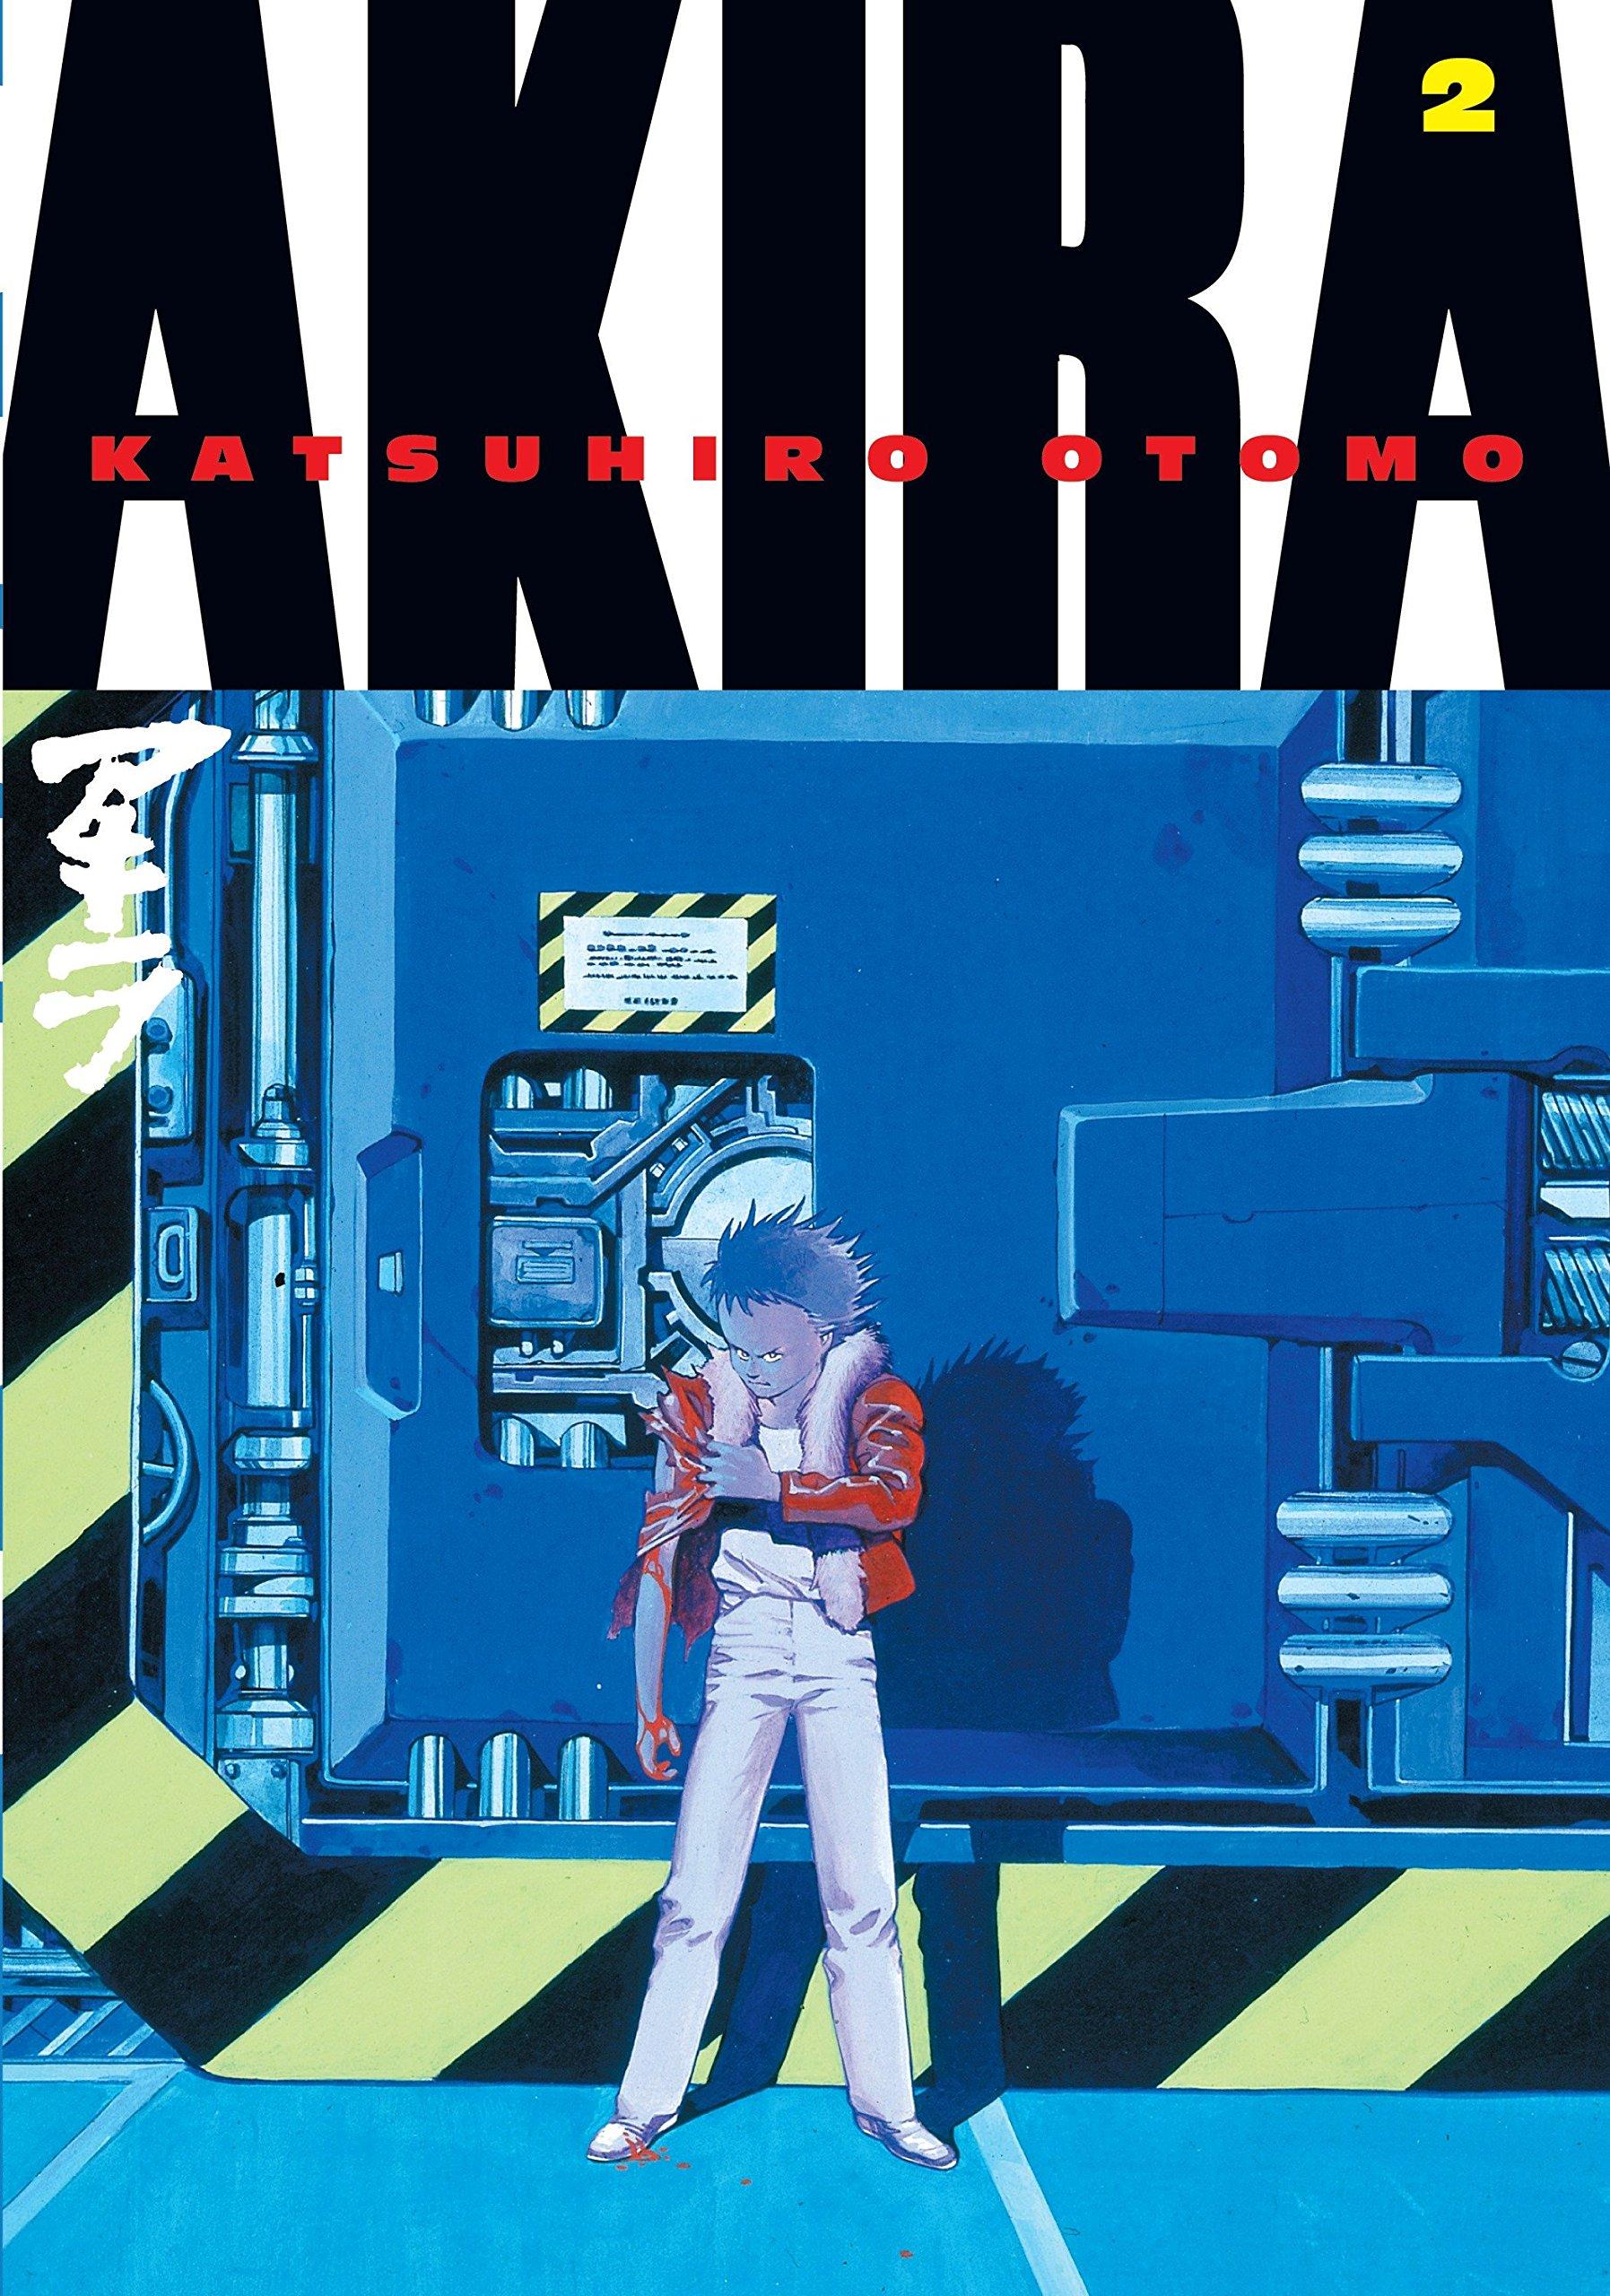 Akira Vol 2 Katsuhiro Otomo 8601404306426 Amazon Com Books